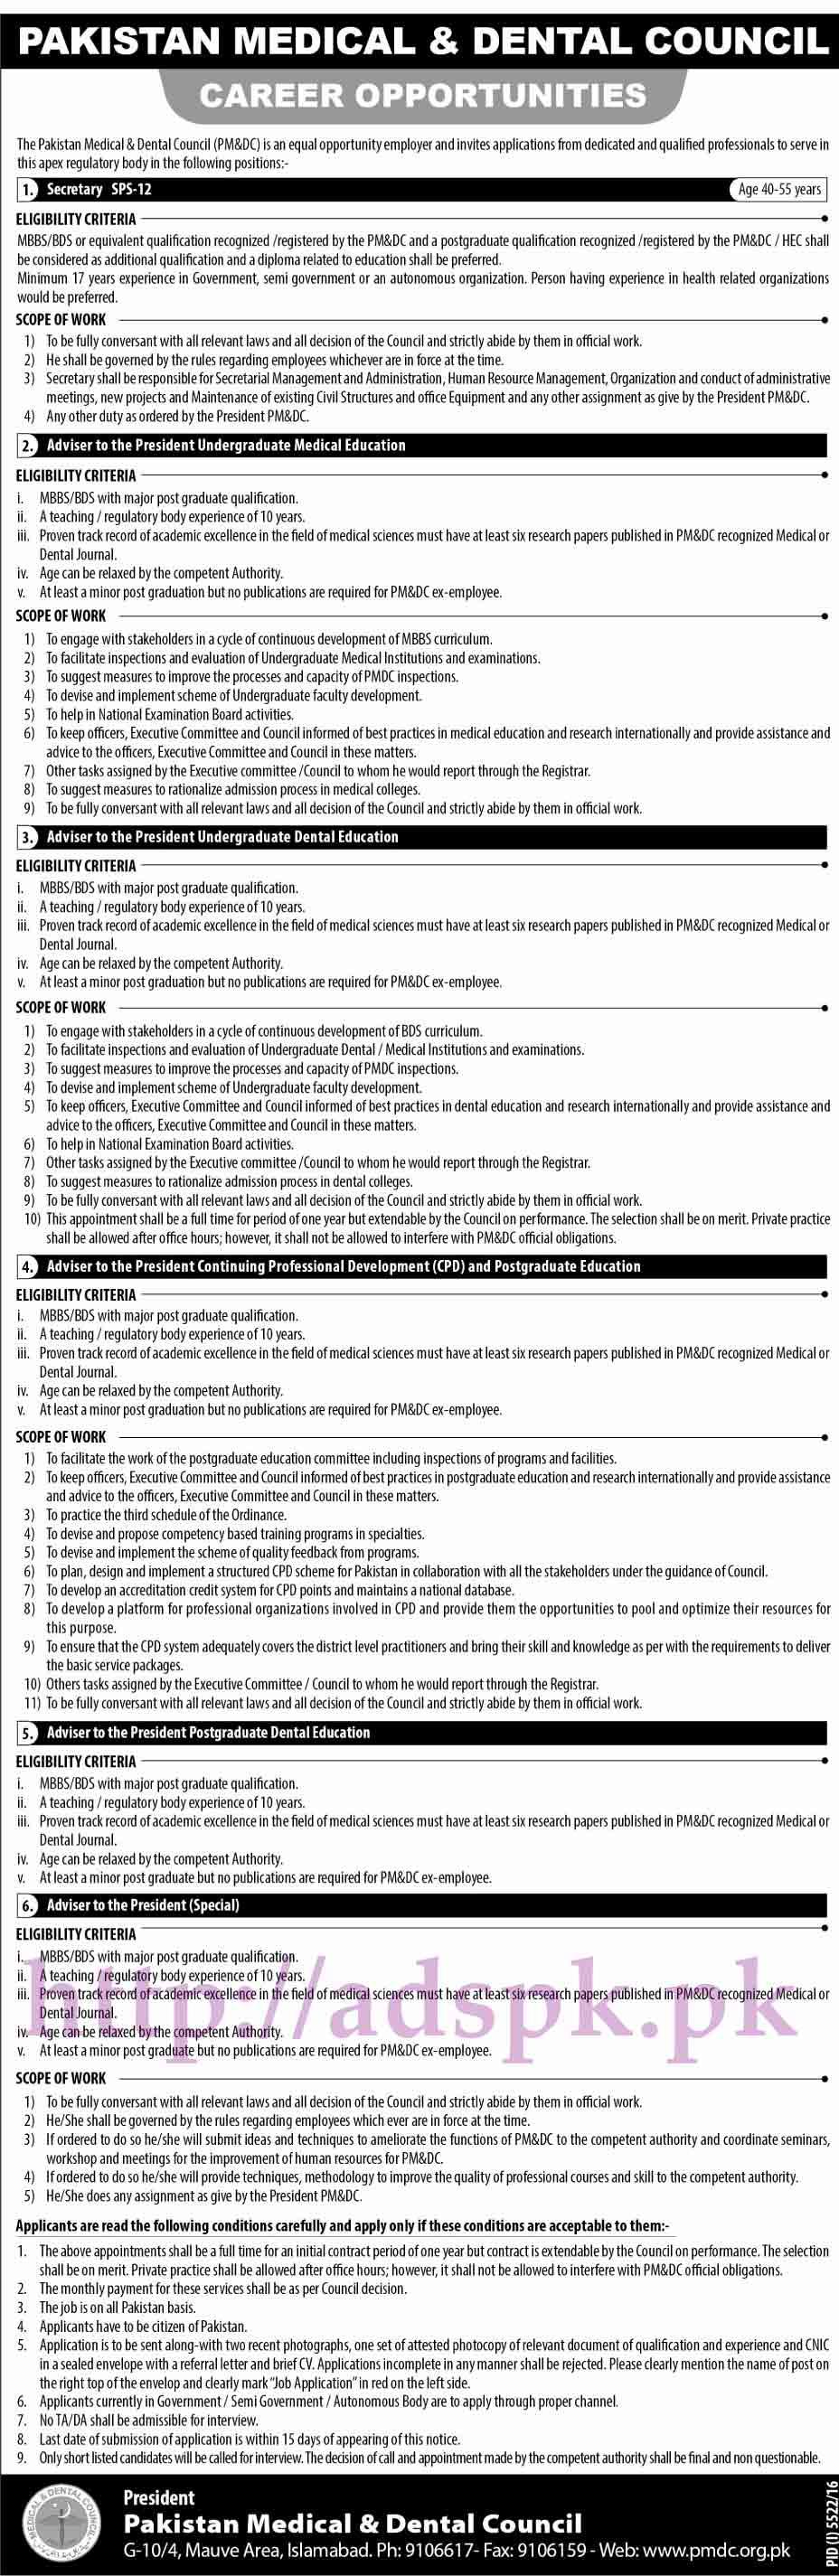 new jobs medical and dental council islamabad jobs  new jobs medical and dental council islamabad jobs 2017 for secretary advisors various disciplines